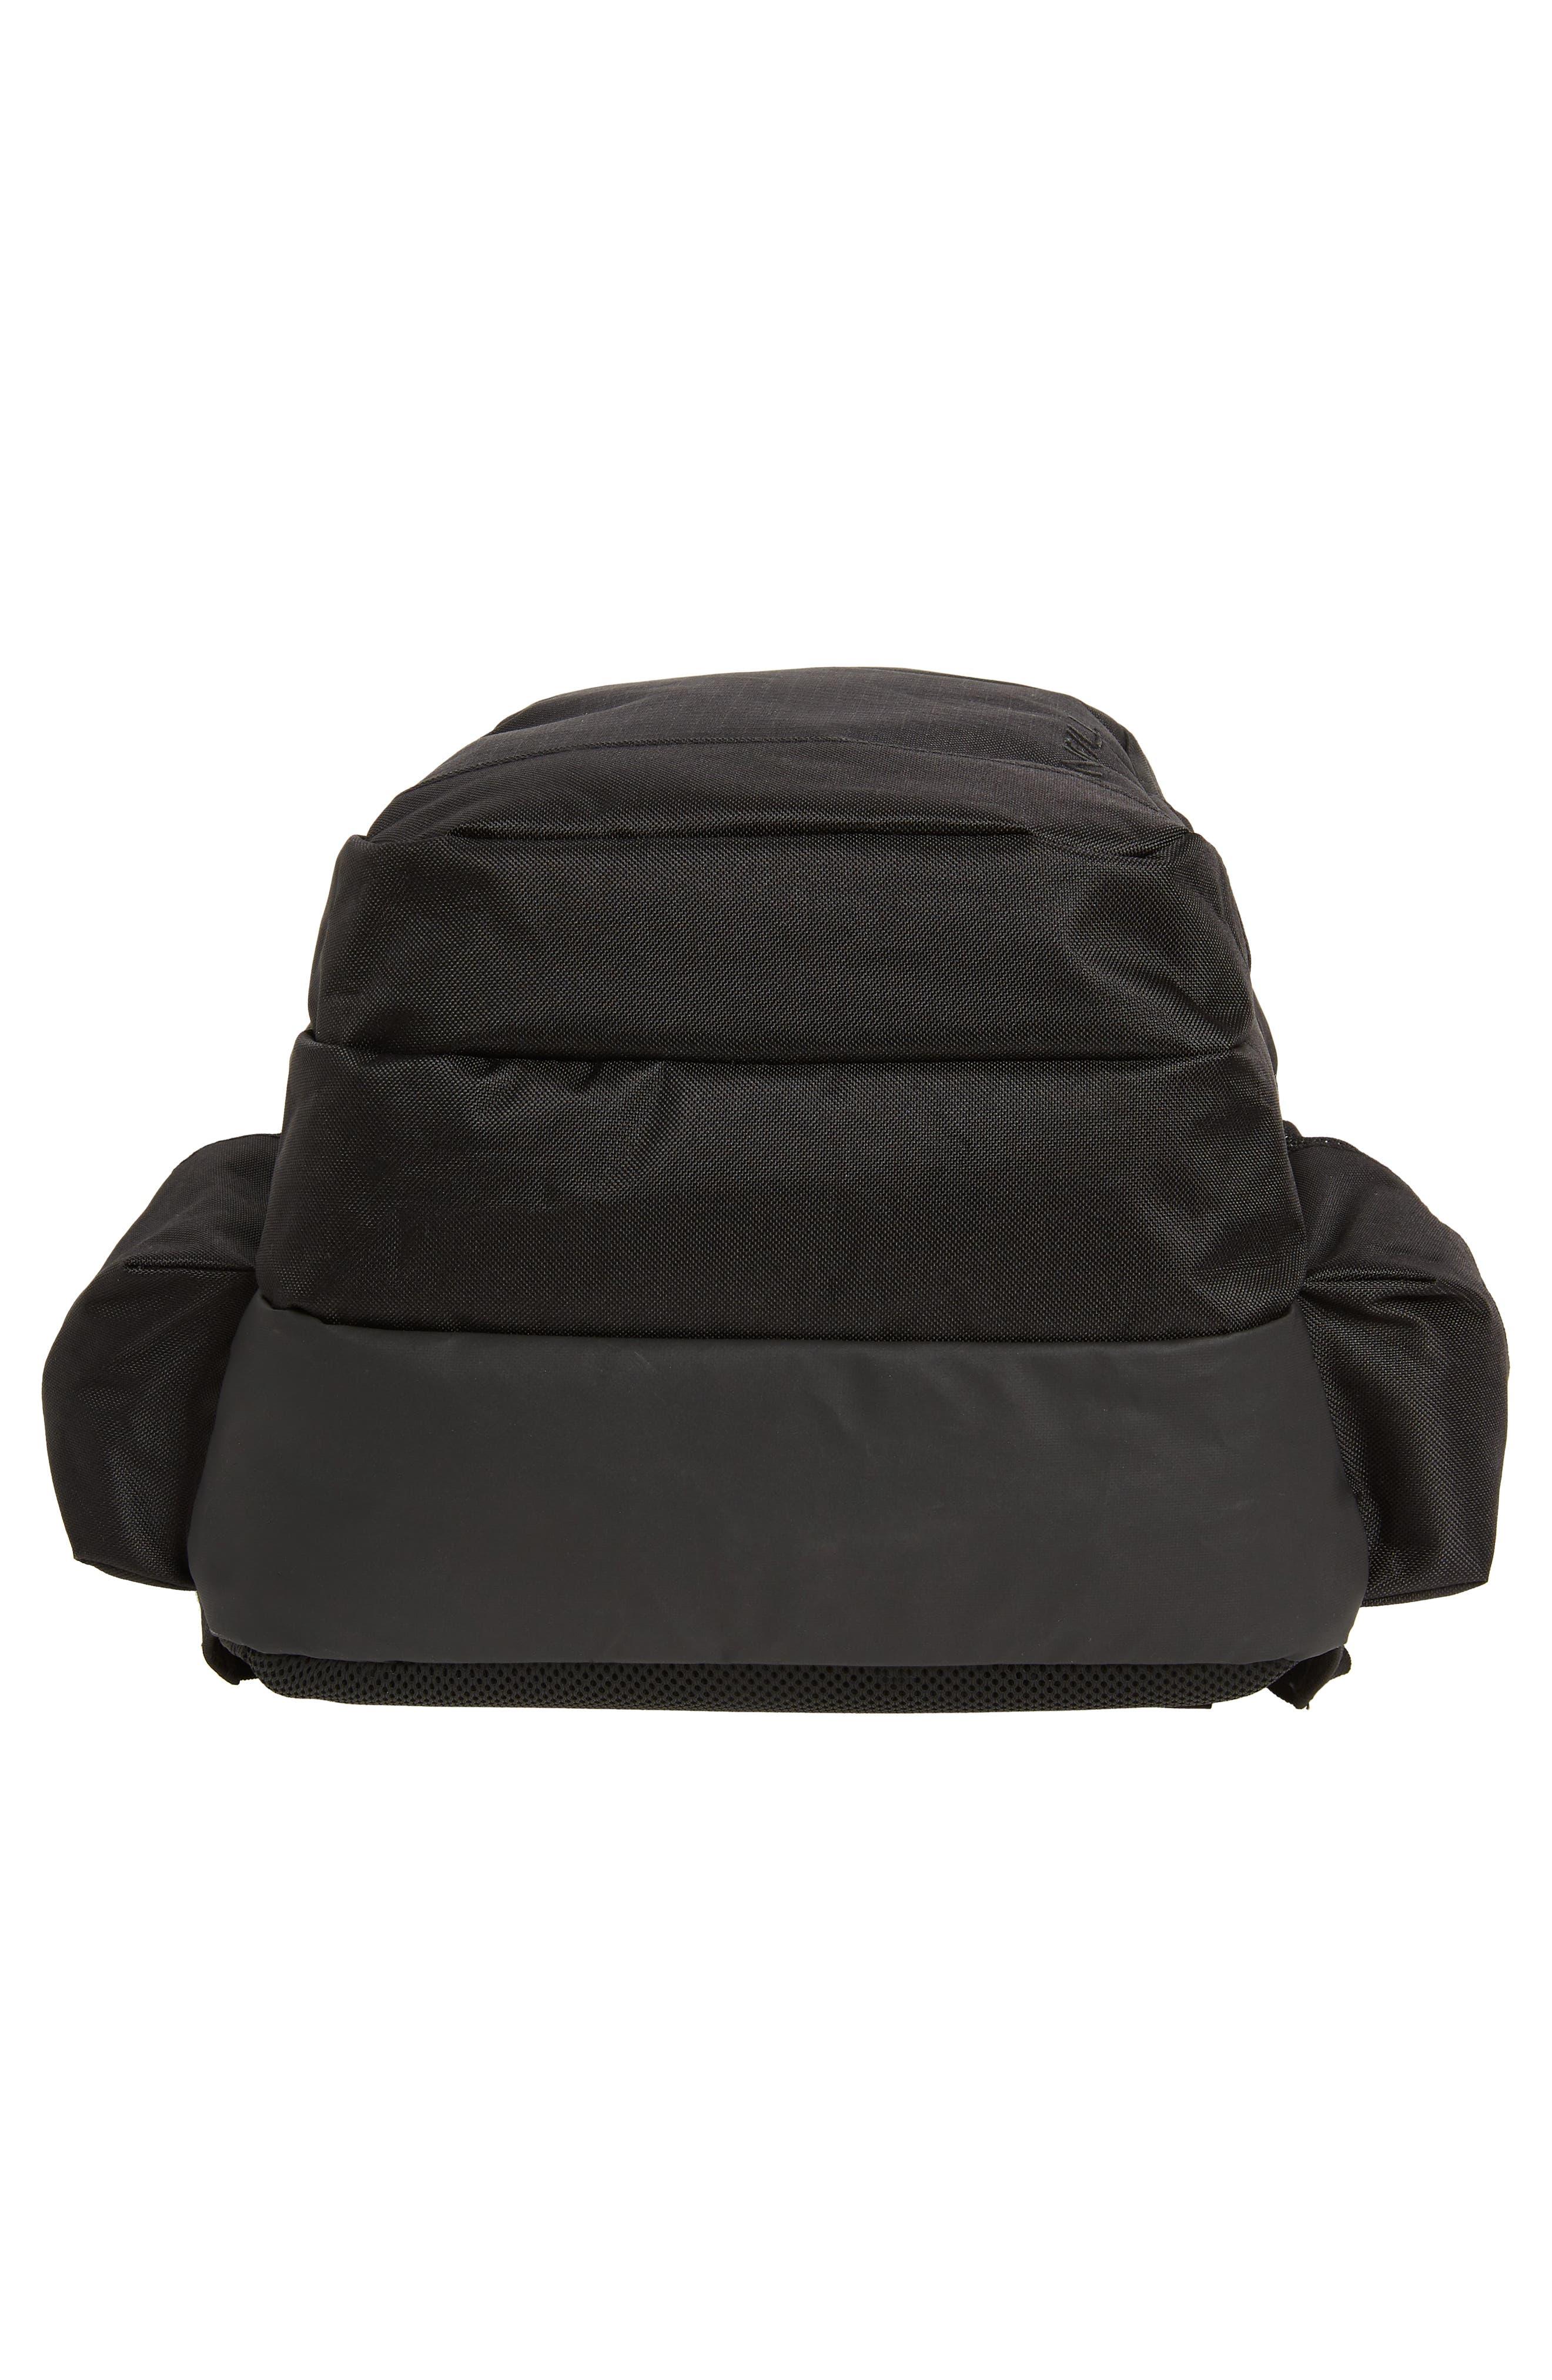 Traverse Backpack,                             Alternate thumbnail 6, color,                             001